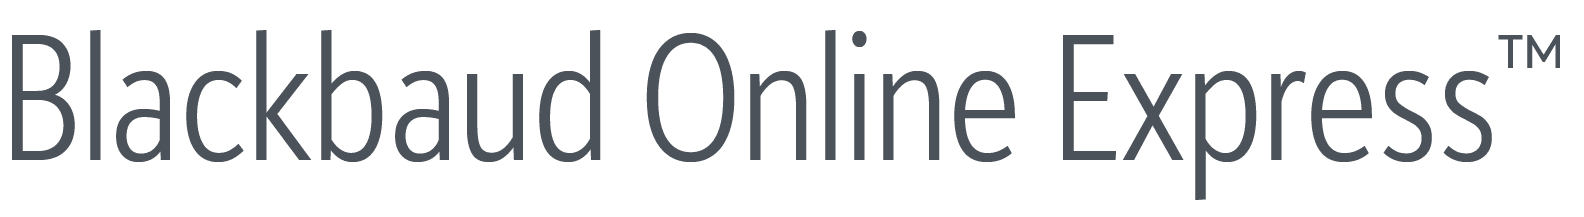 Blackbaud Online Express Gray